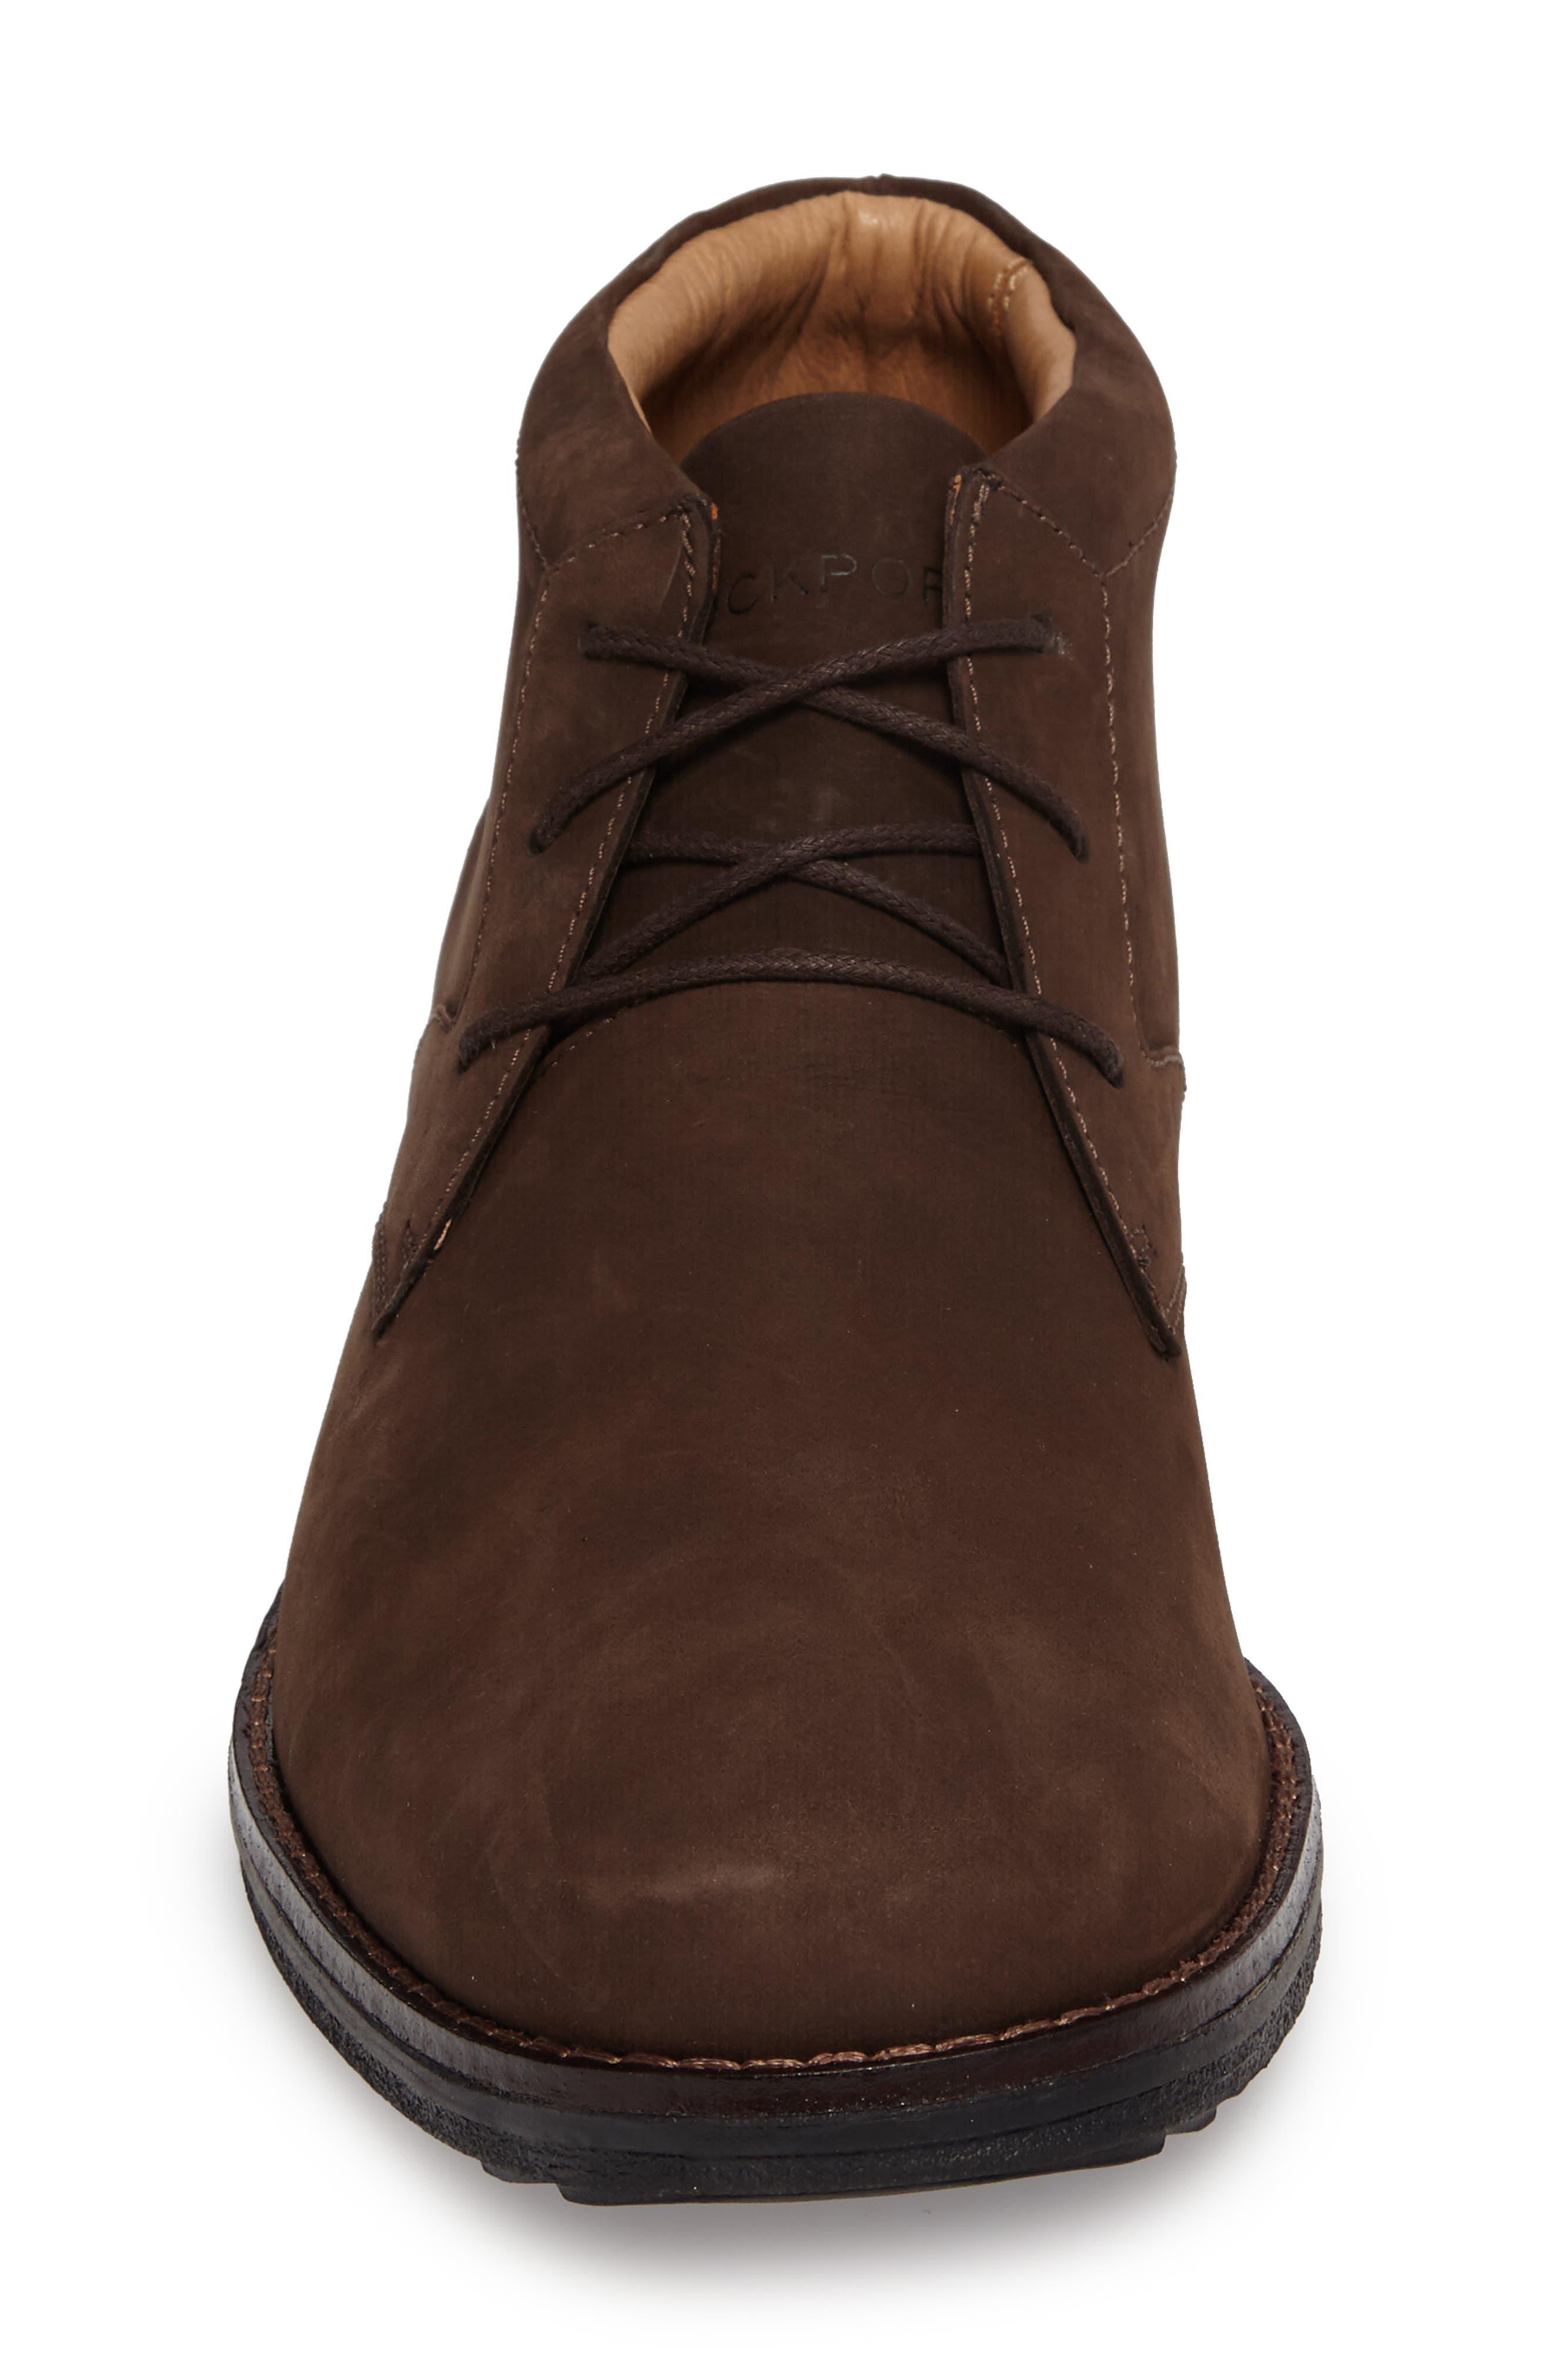 Premium Class Chukka Boot,                             Alternate thumbnail 4, color,                             Brown Nubuck